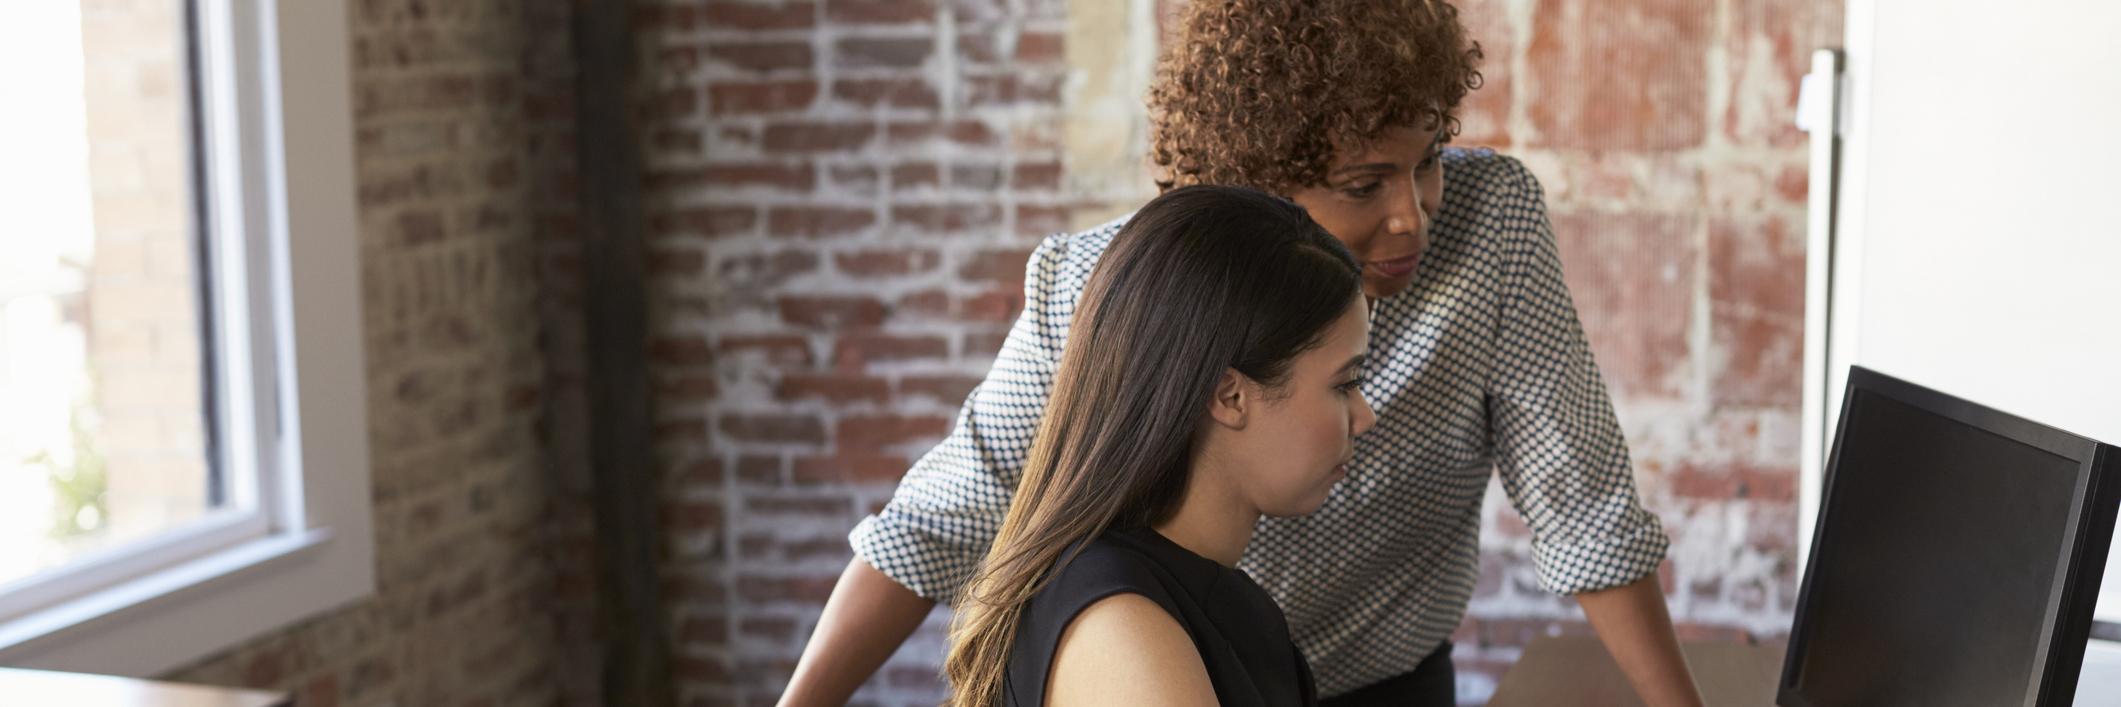 Businesswoman mentoring a student.